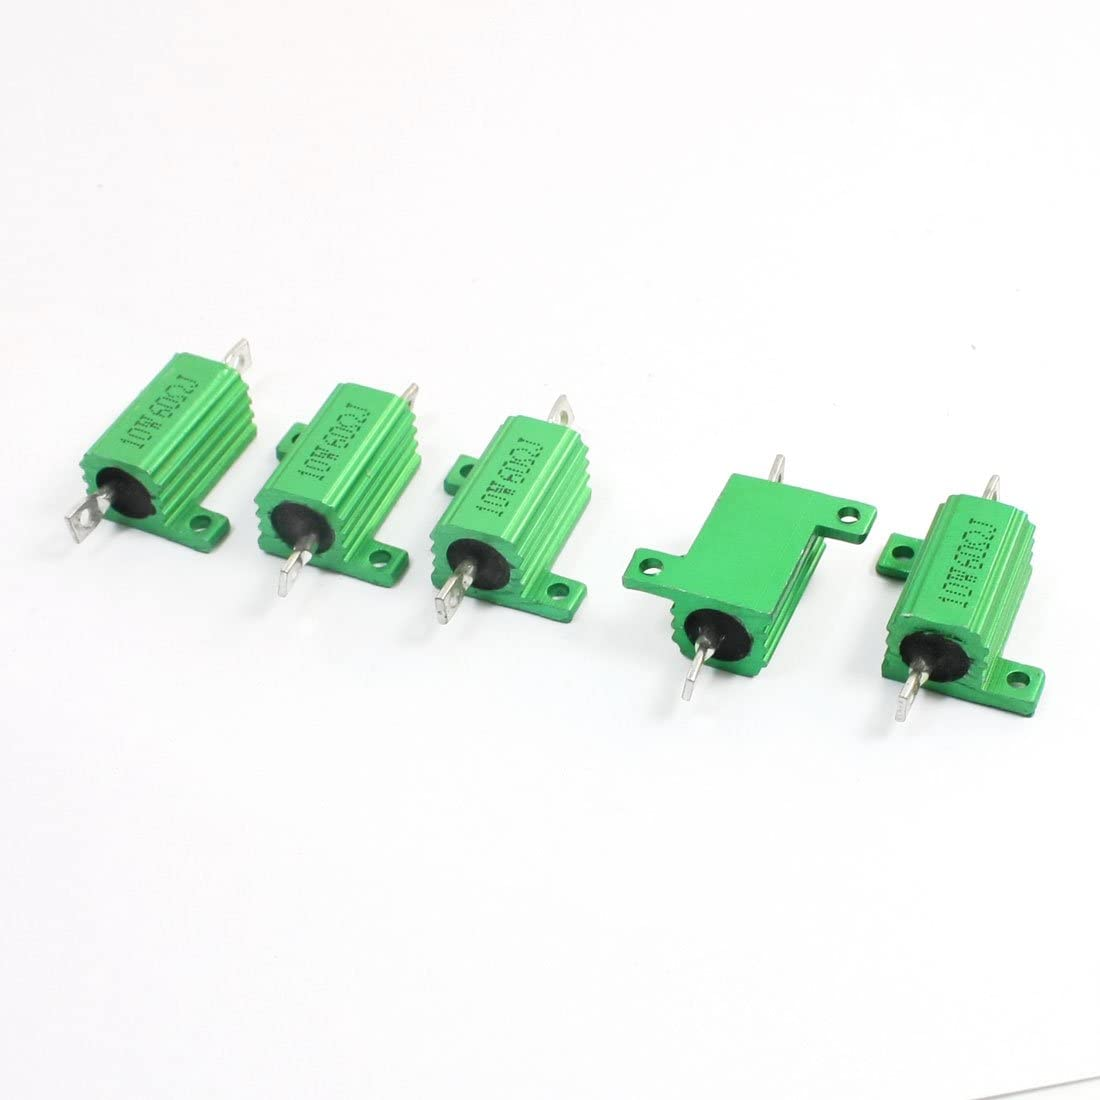 Aexit Houston Mall 5Pcs 68 Fixed Resistors Ohm Heatsink 10W Clad Soldering Aluminium 5%